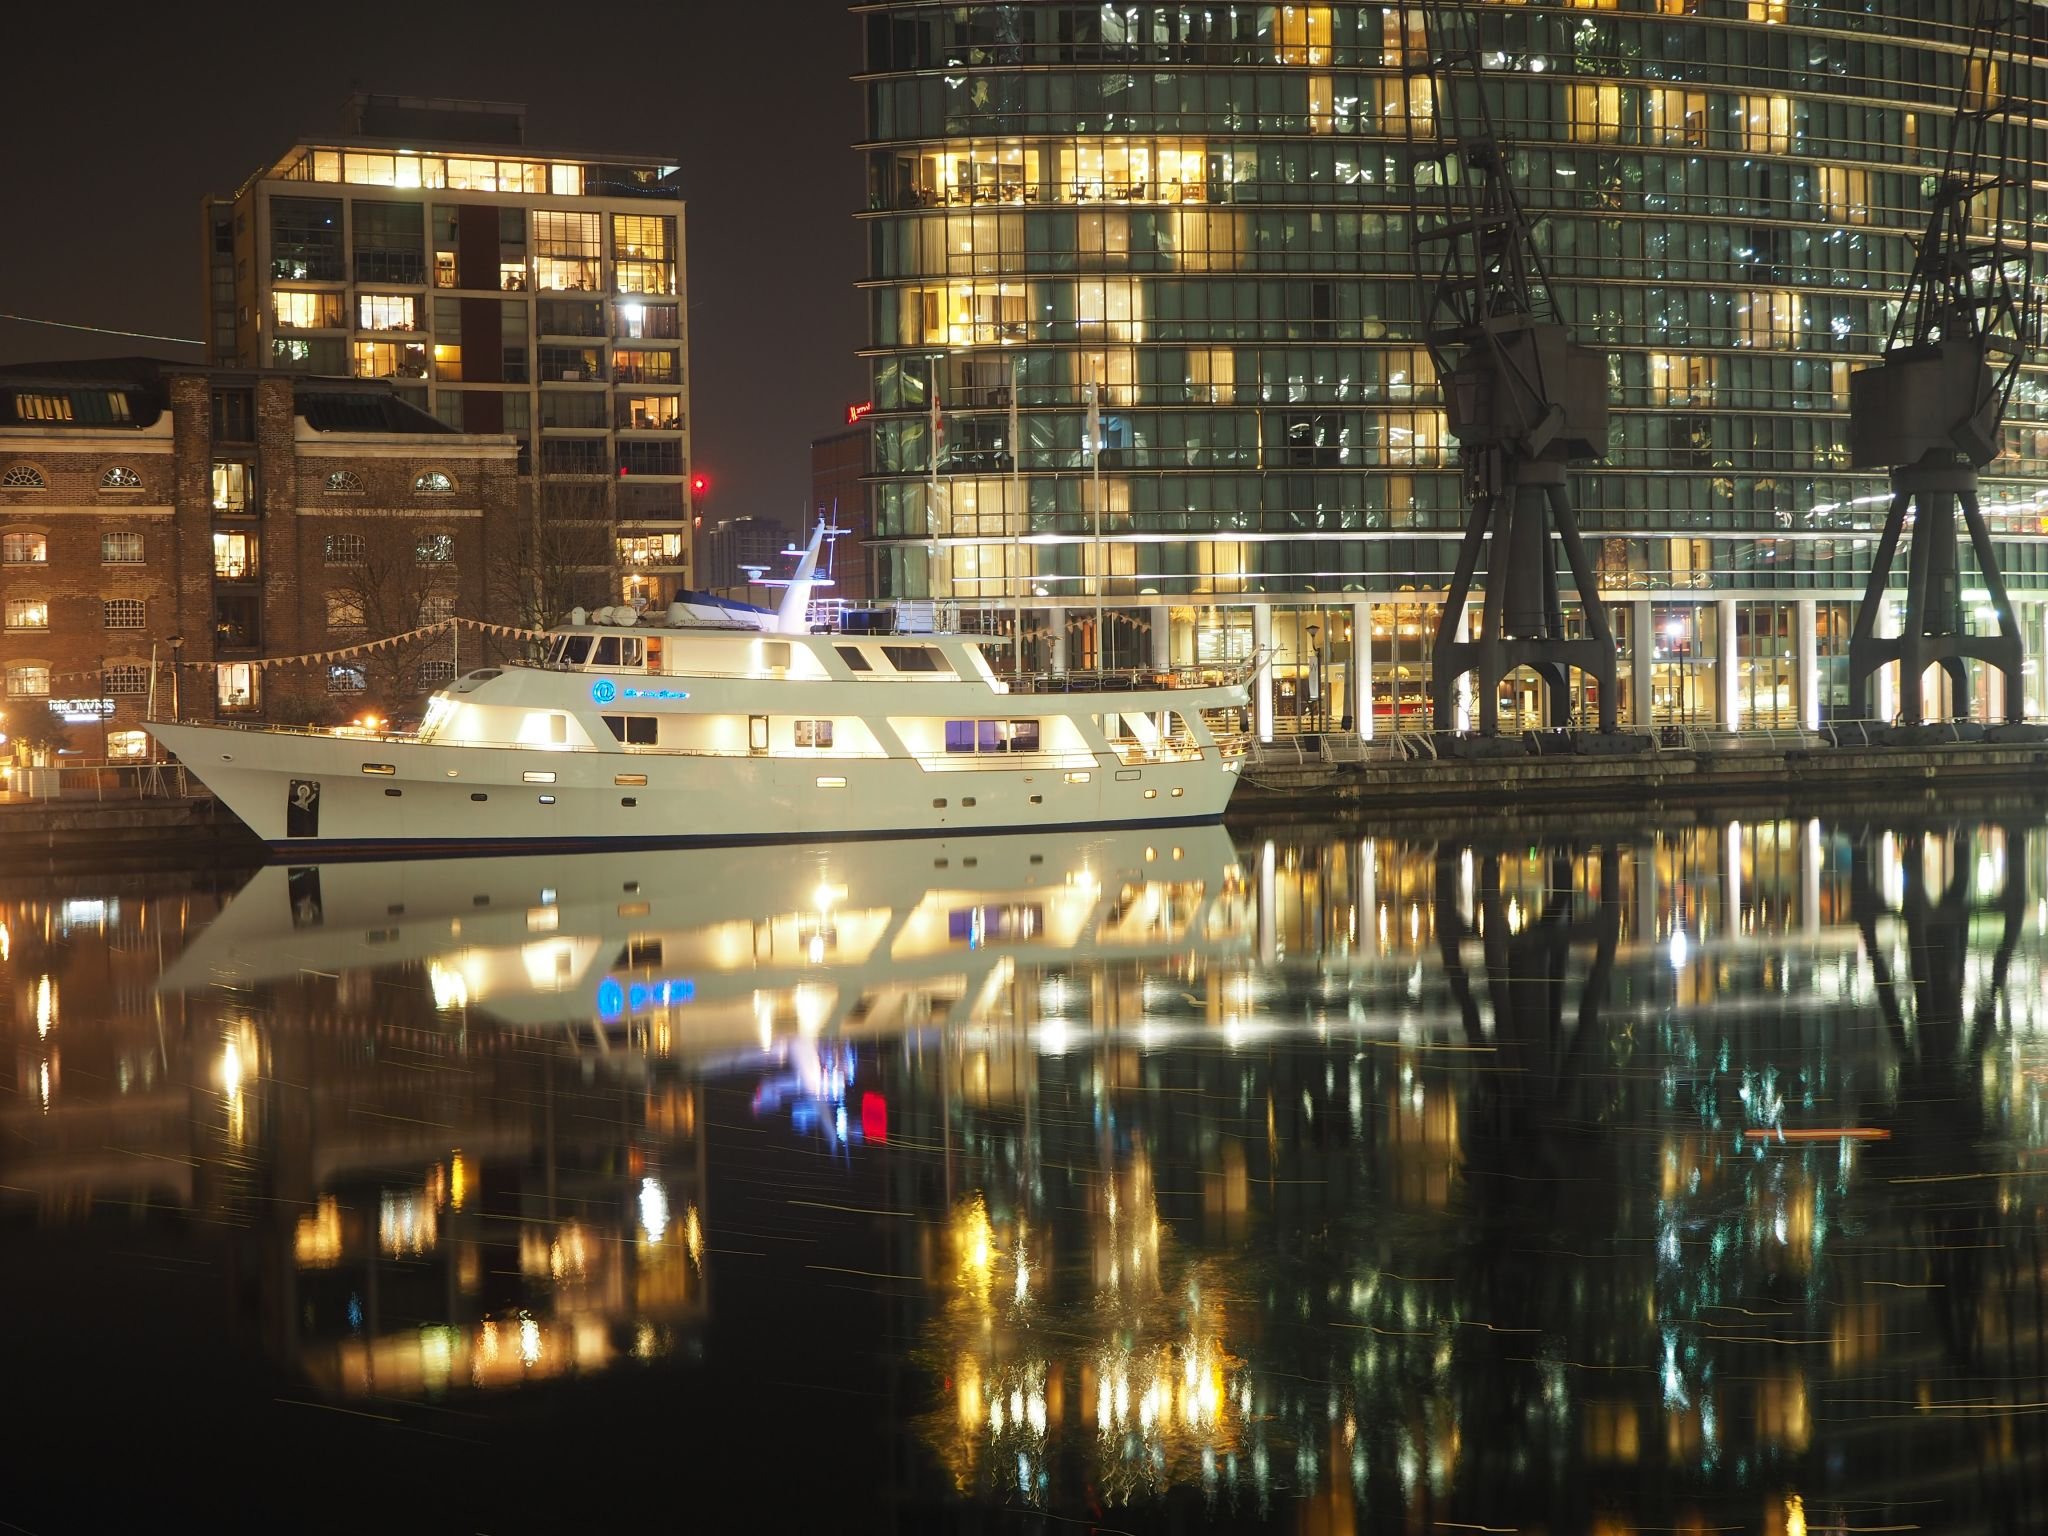 Canary Wharf Boat, United Kingdom